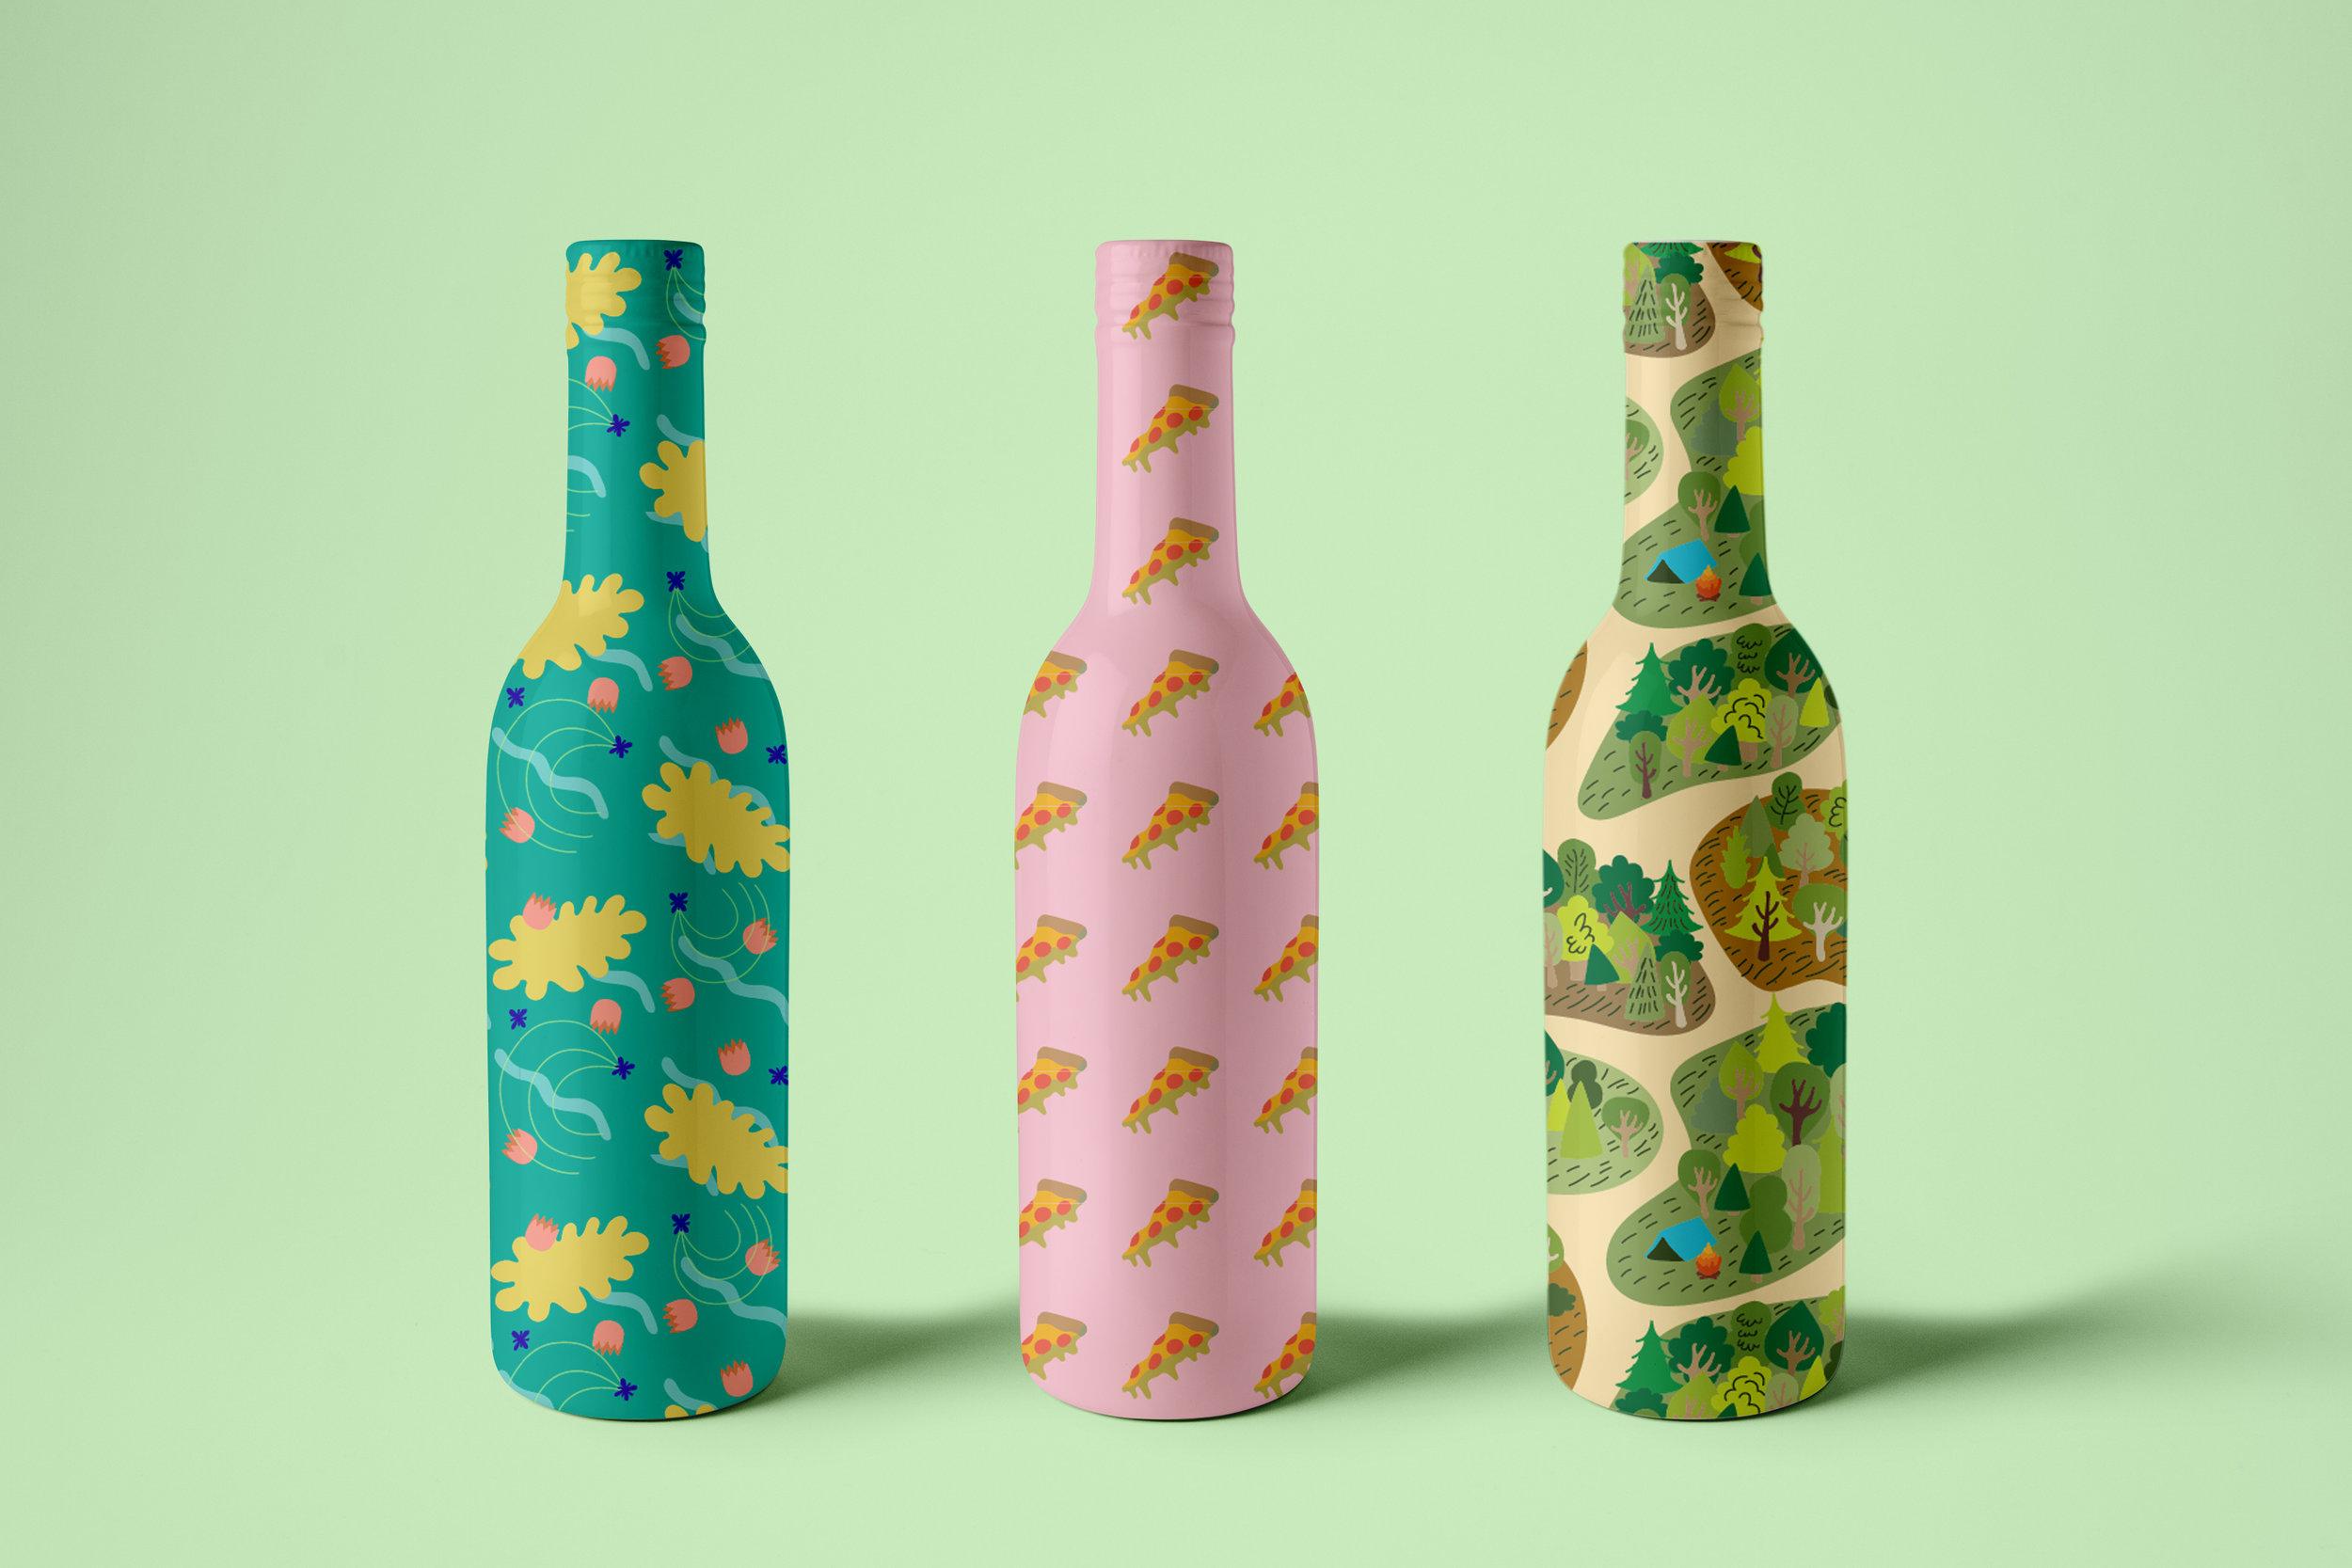 bottle concpet design